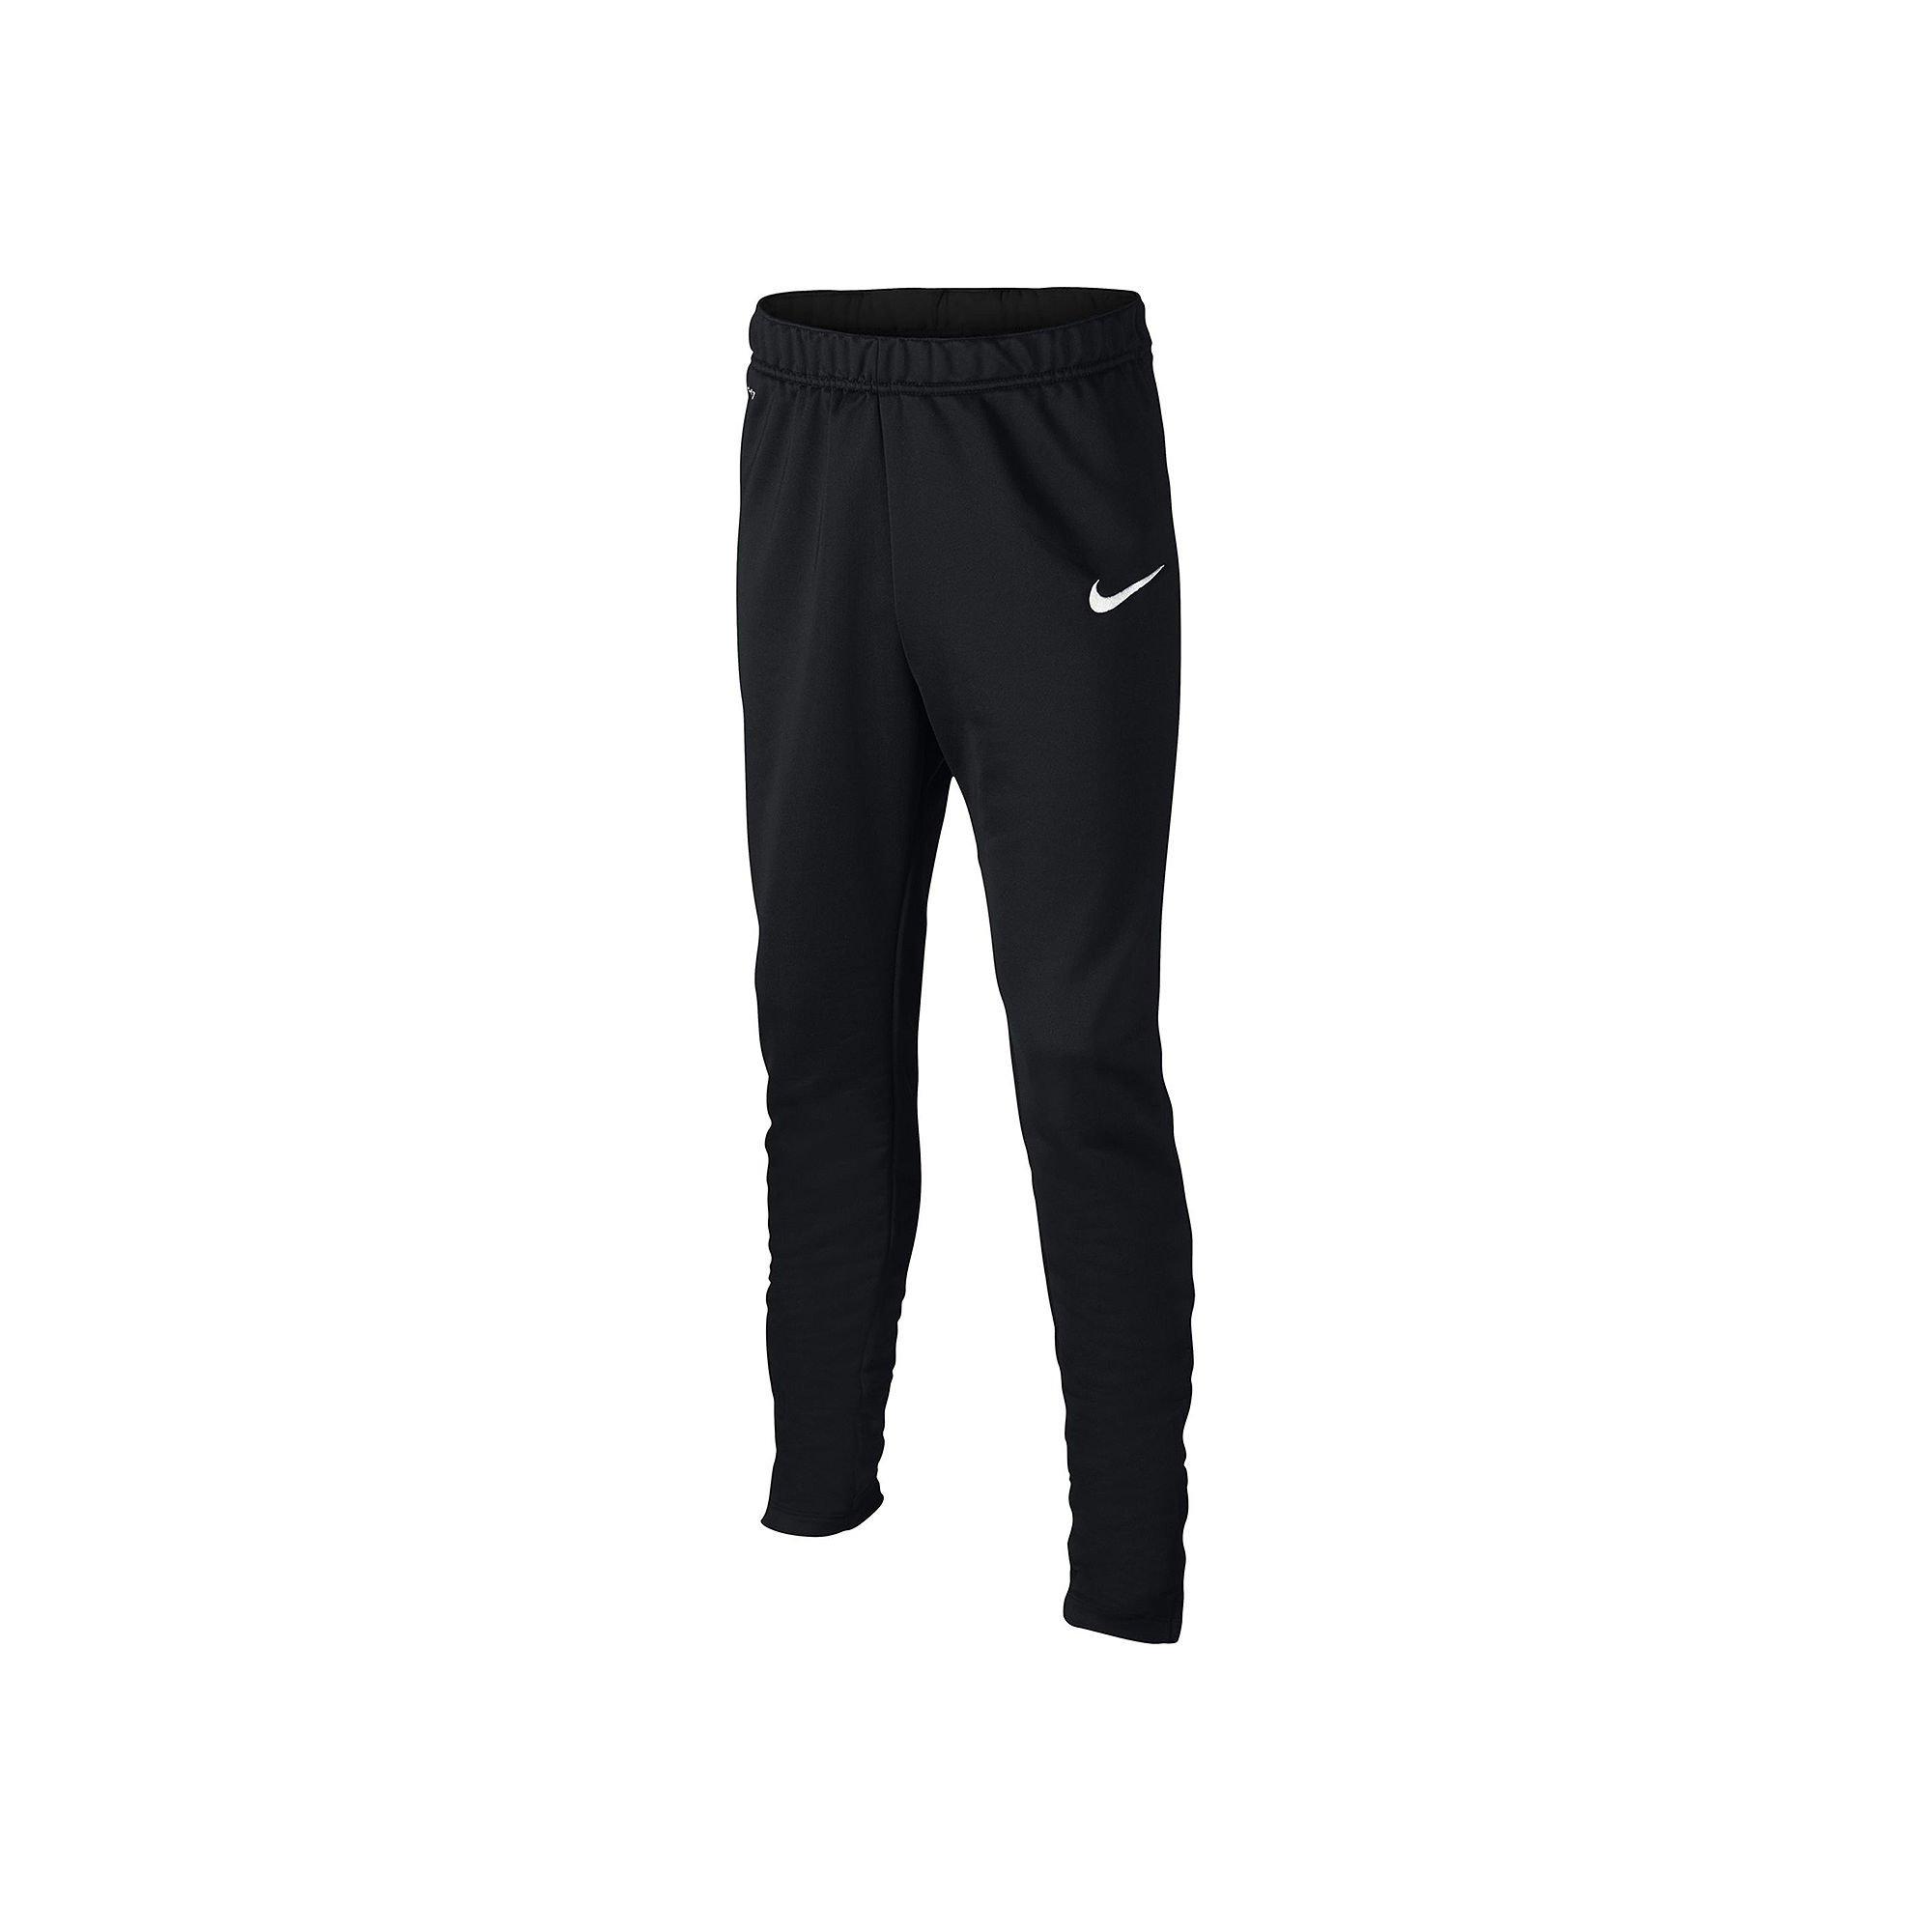 Nike Unisex Academy Boys Tech Sports Pants (YM) Black by Nike